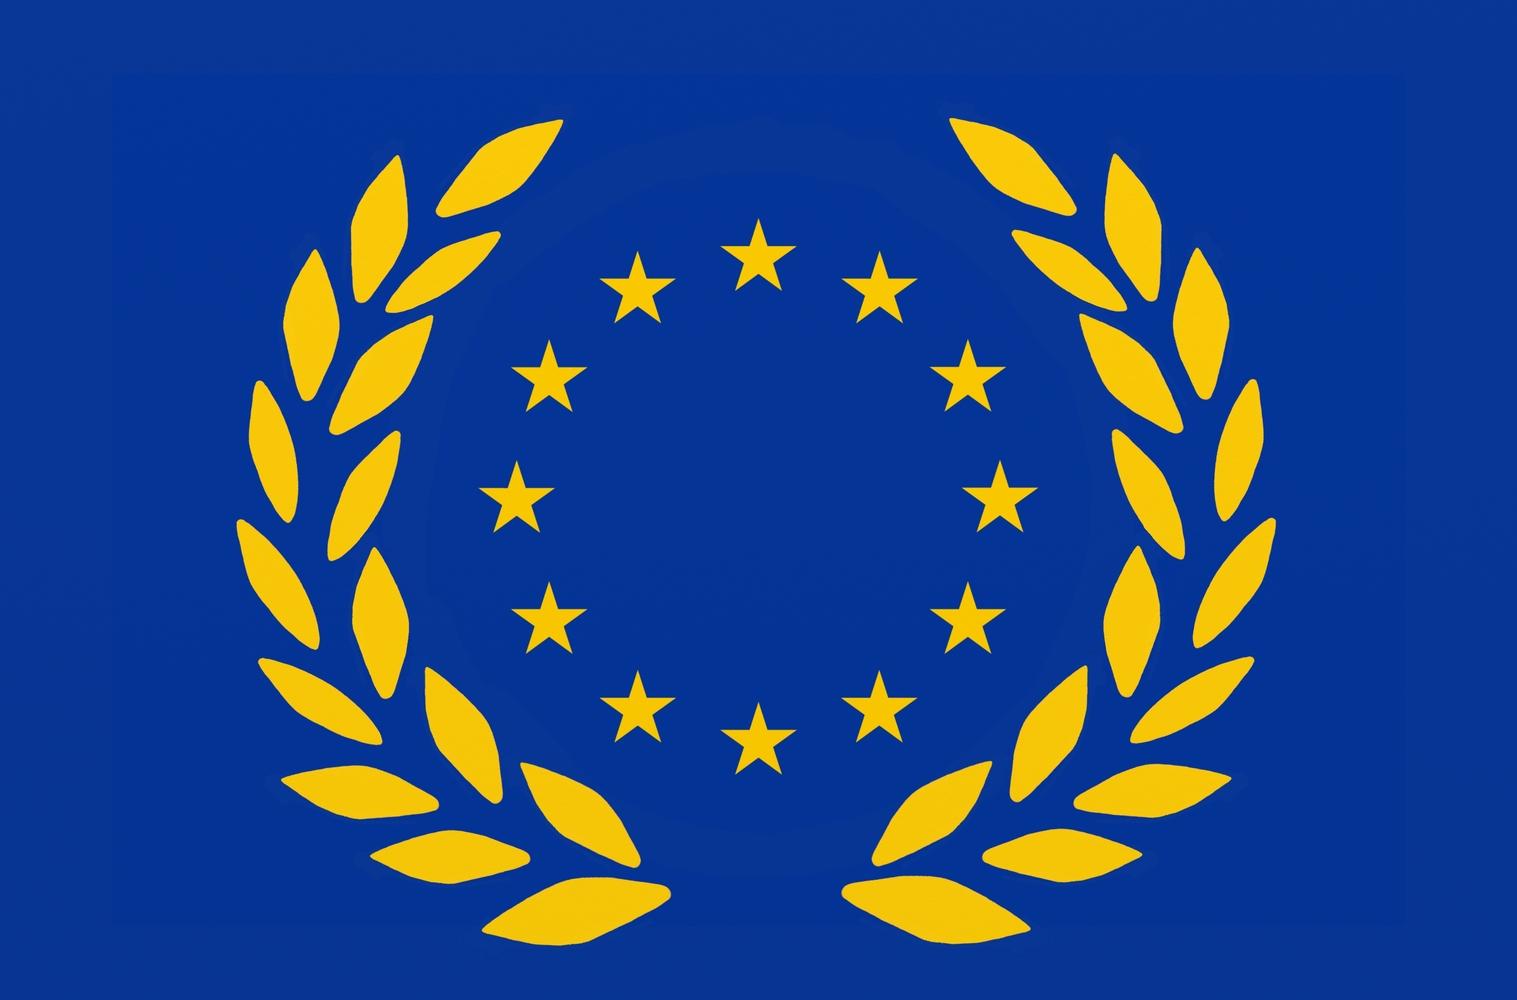 Europa Fahne neu.jpg